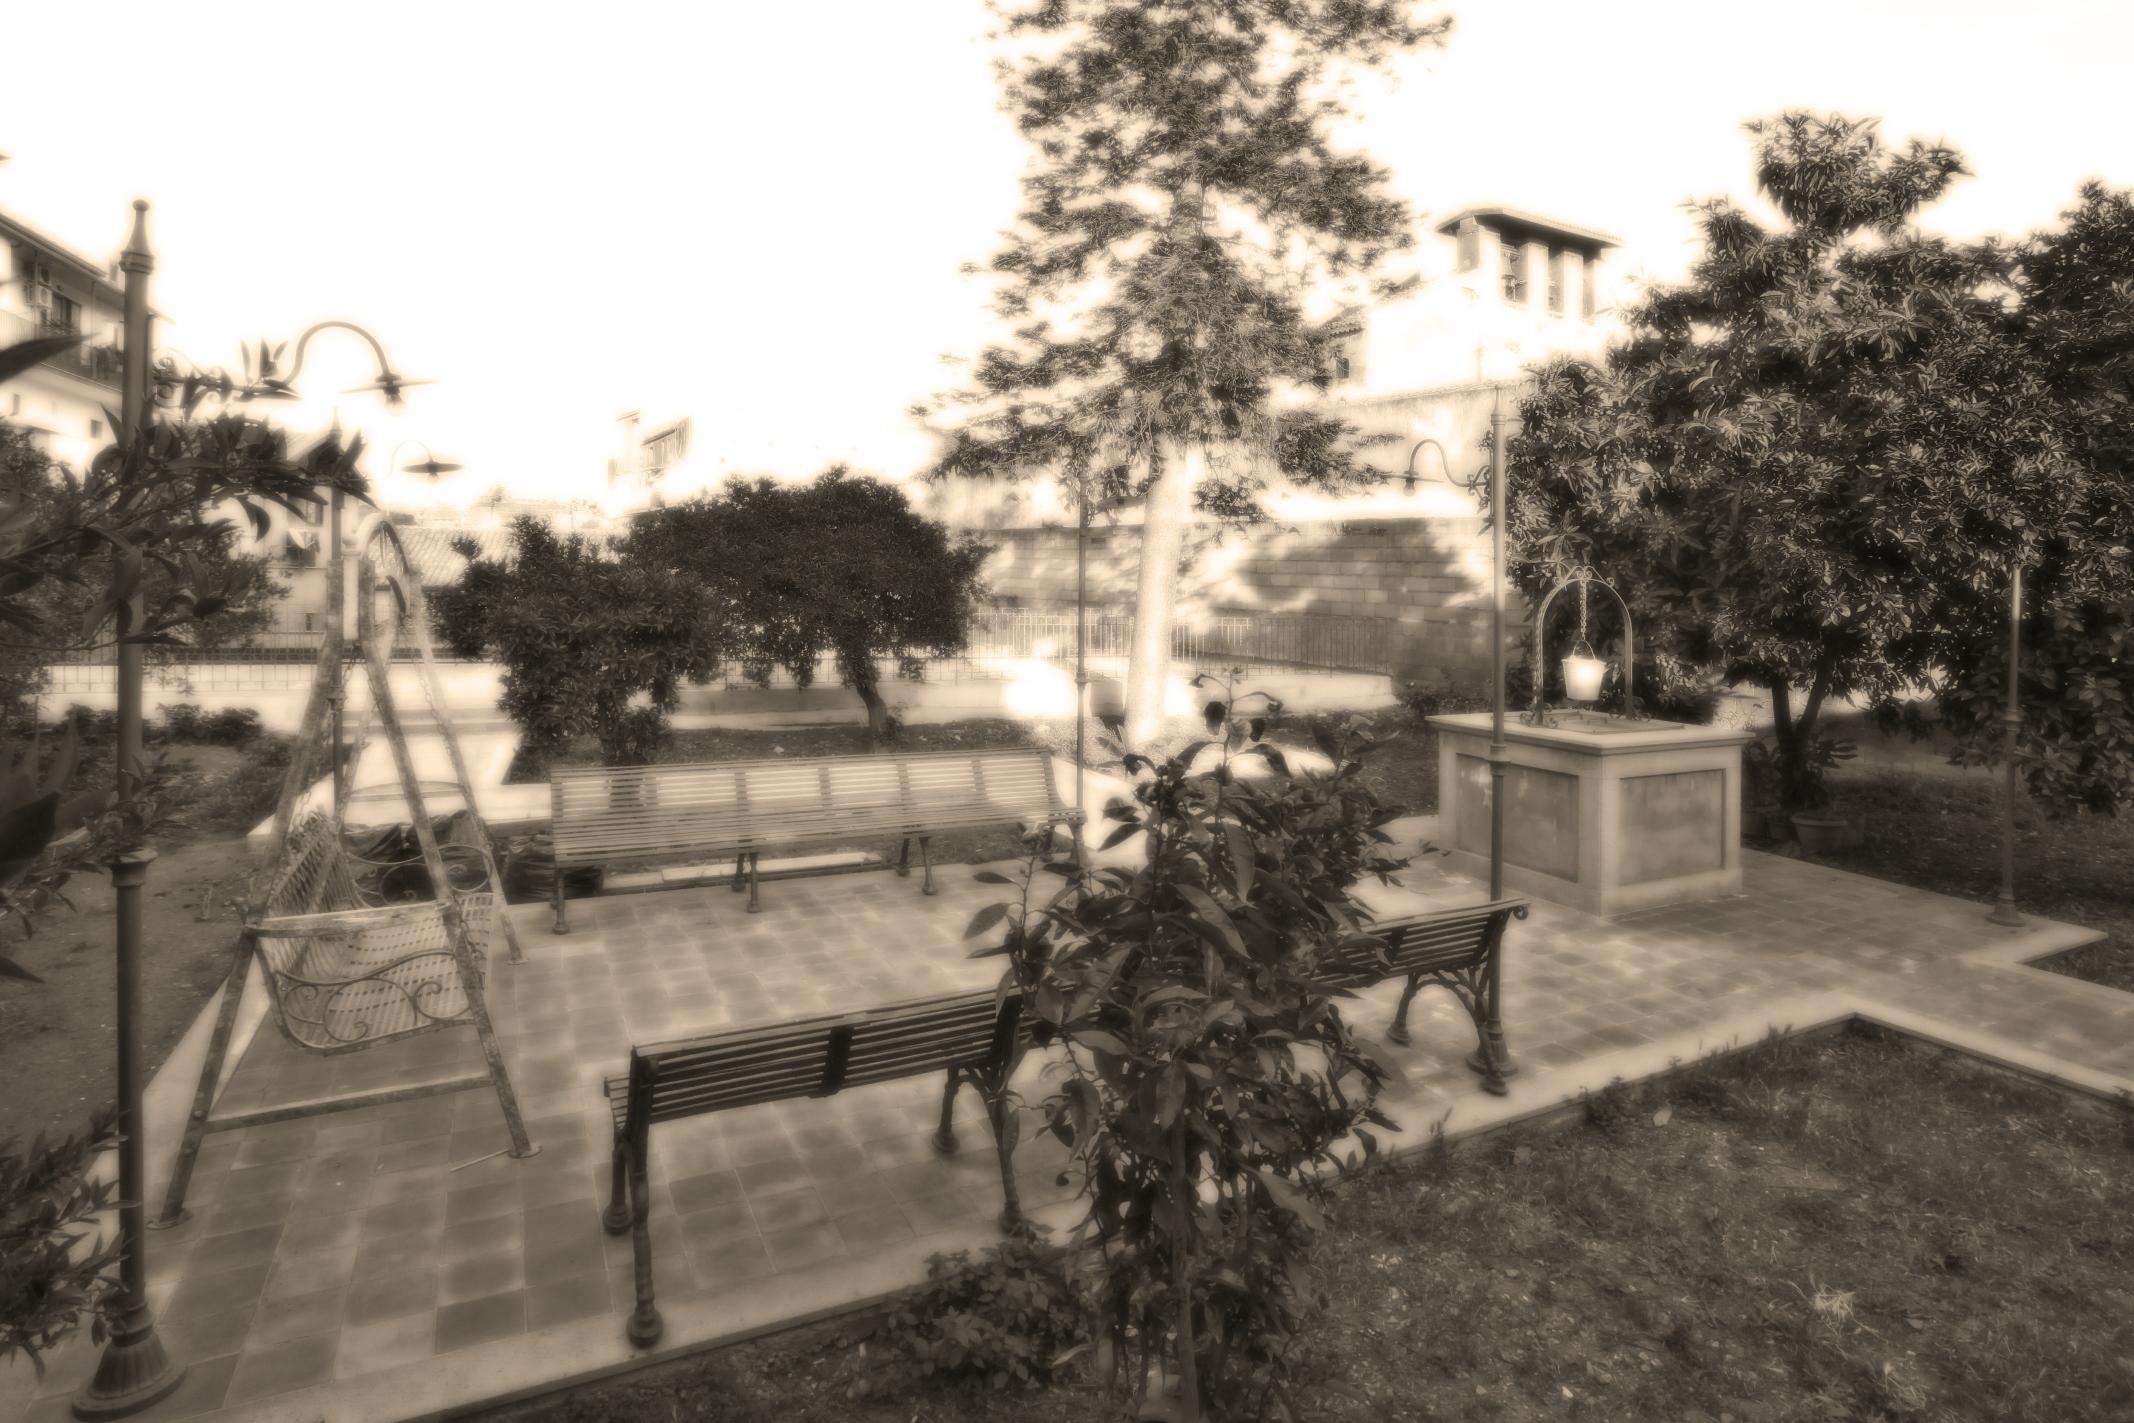 Maison de vacances A Casa di Ludo mit parkplatz (2124257), Catania, Catania, Sicile, Italie, image 29